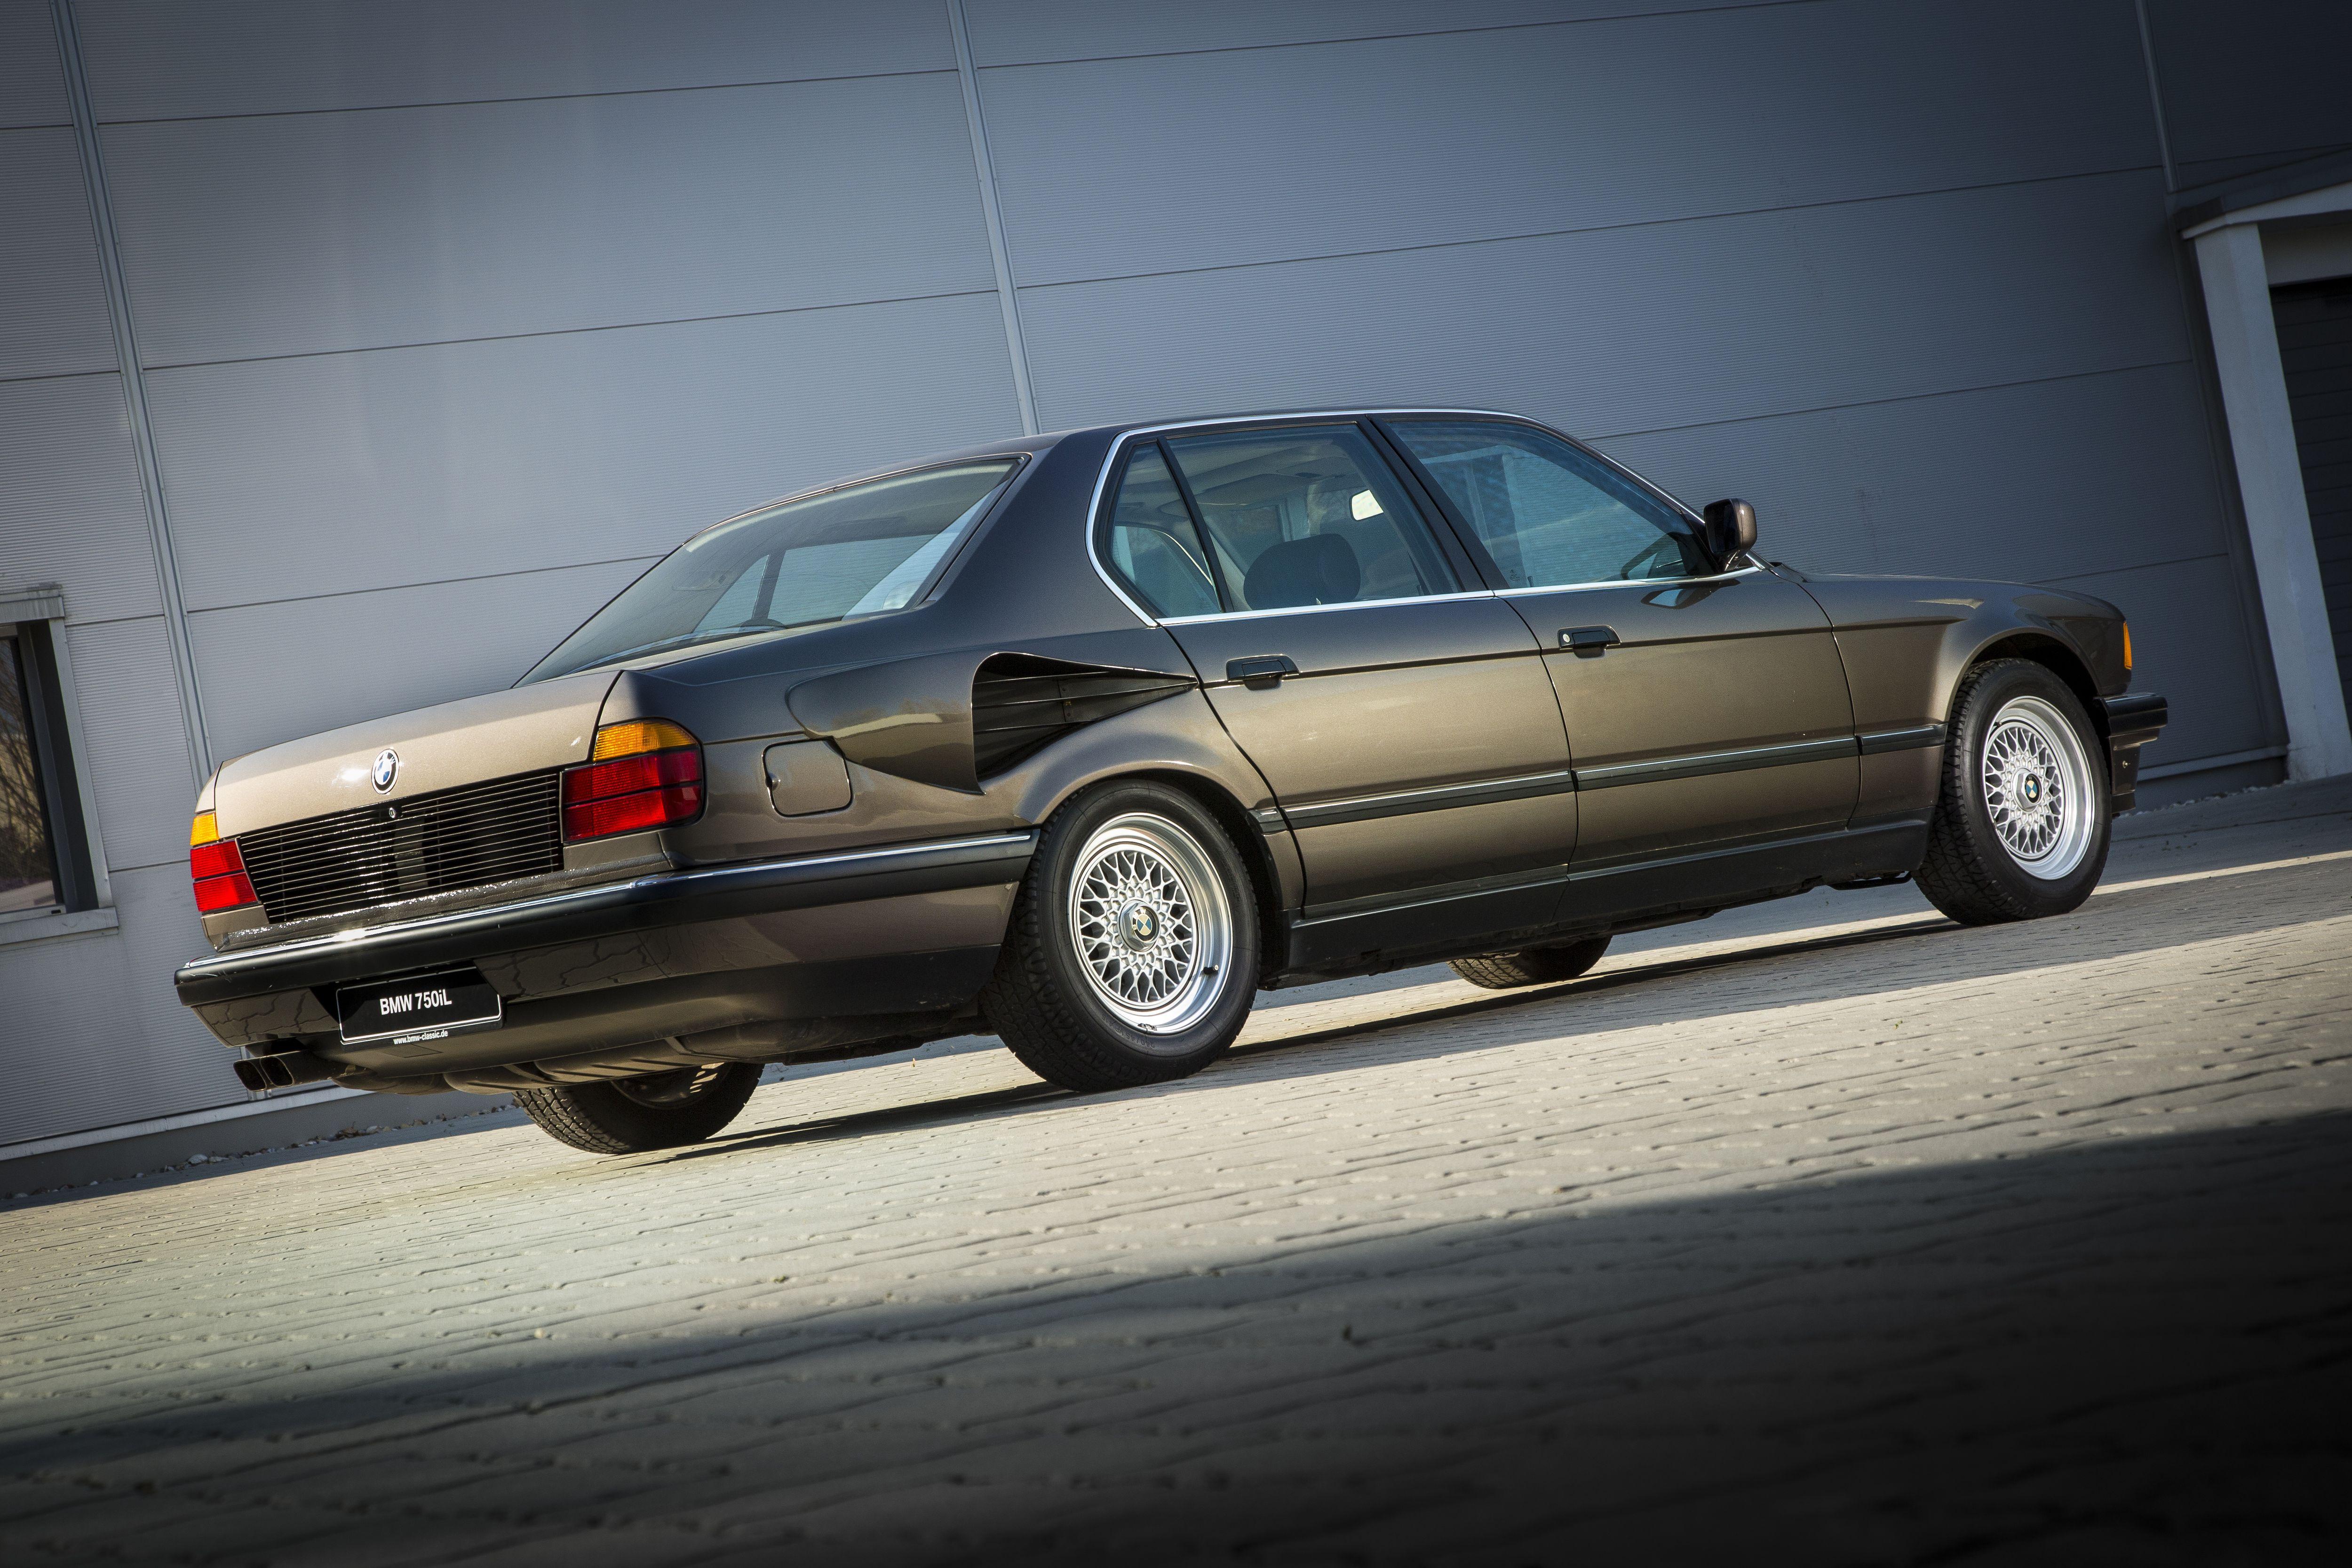 Zanimljivost dana: Zlatna ribica – V16 motor marke BMW